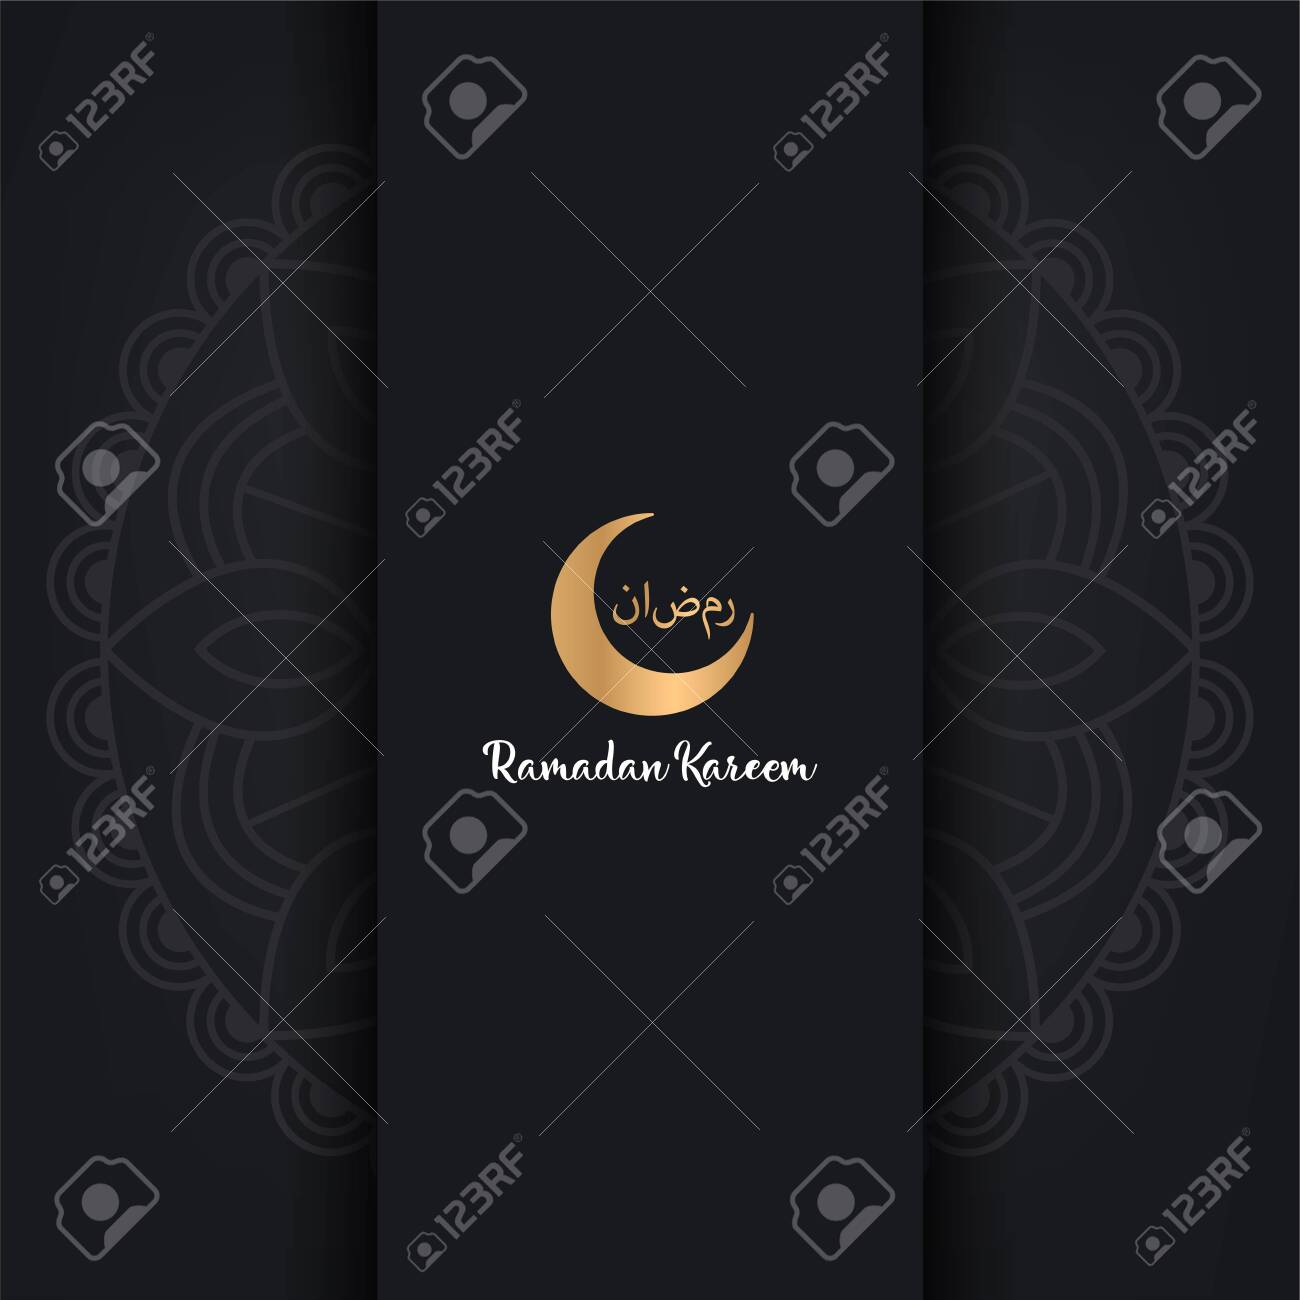 Ramadam kareem poster. Islamic culture - Vector illustration - 145645304